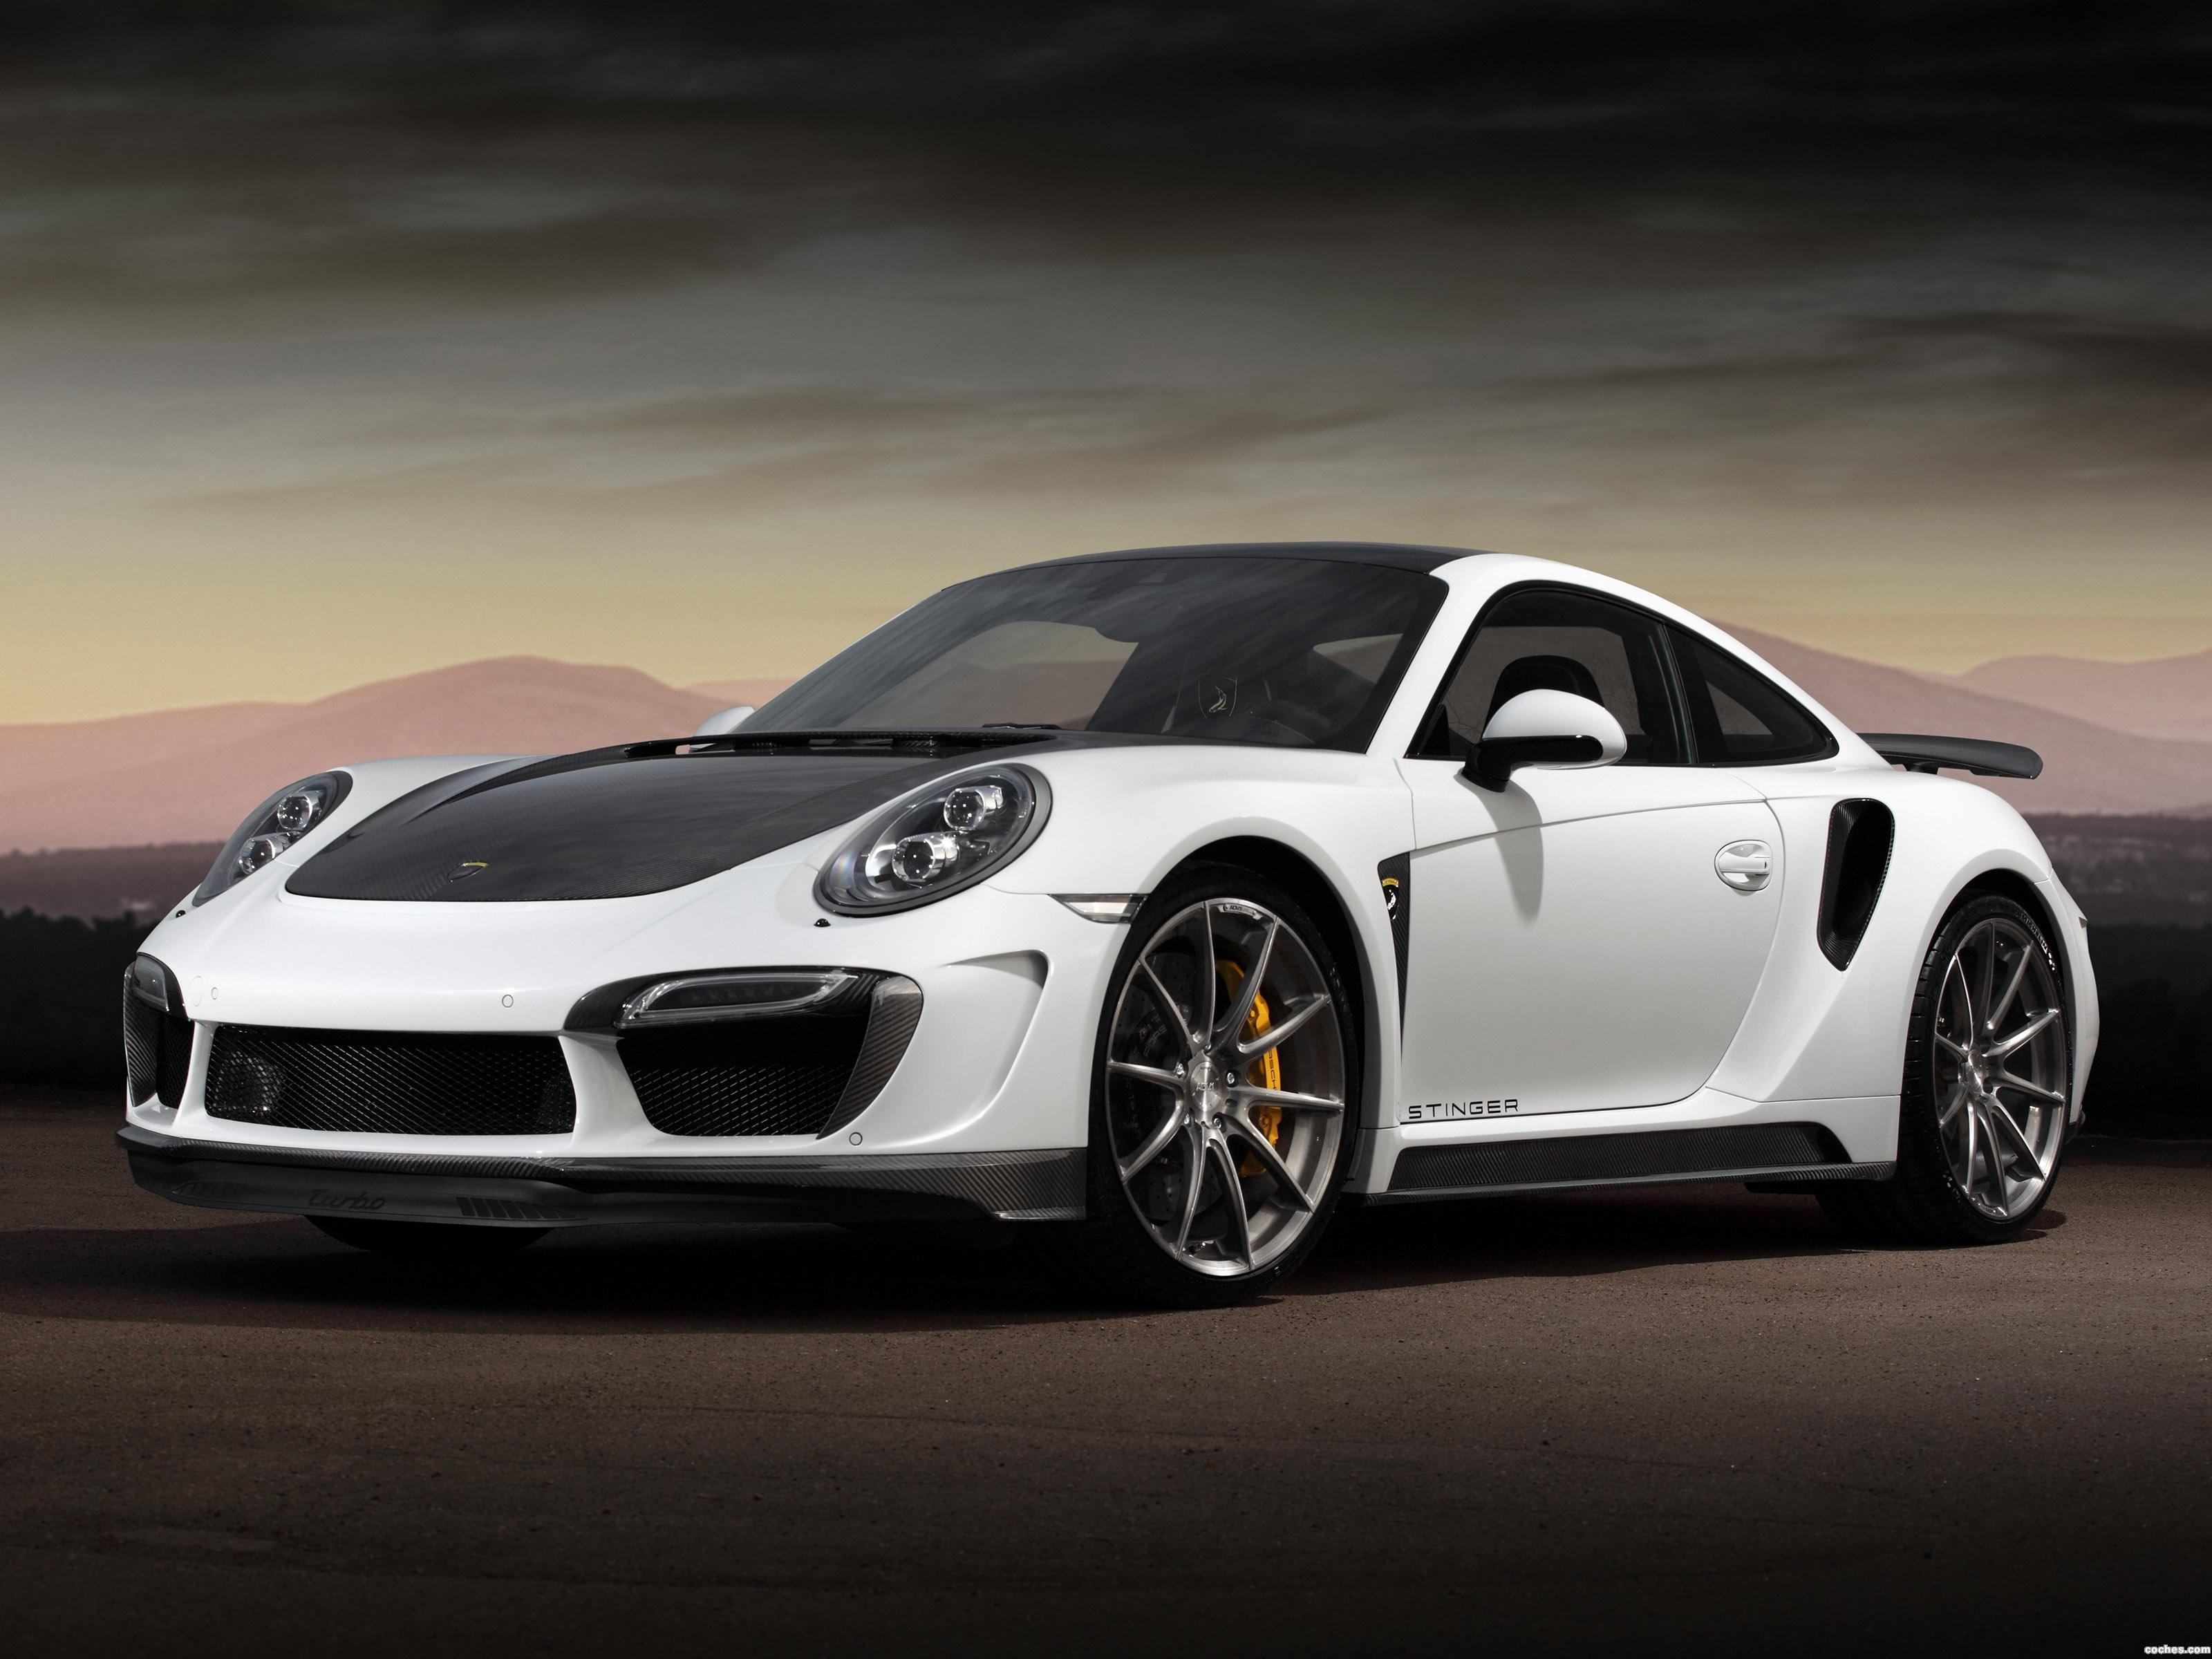 Foto 0 de Topcar Porsche 911 Turbo Stinger GTR 2014